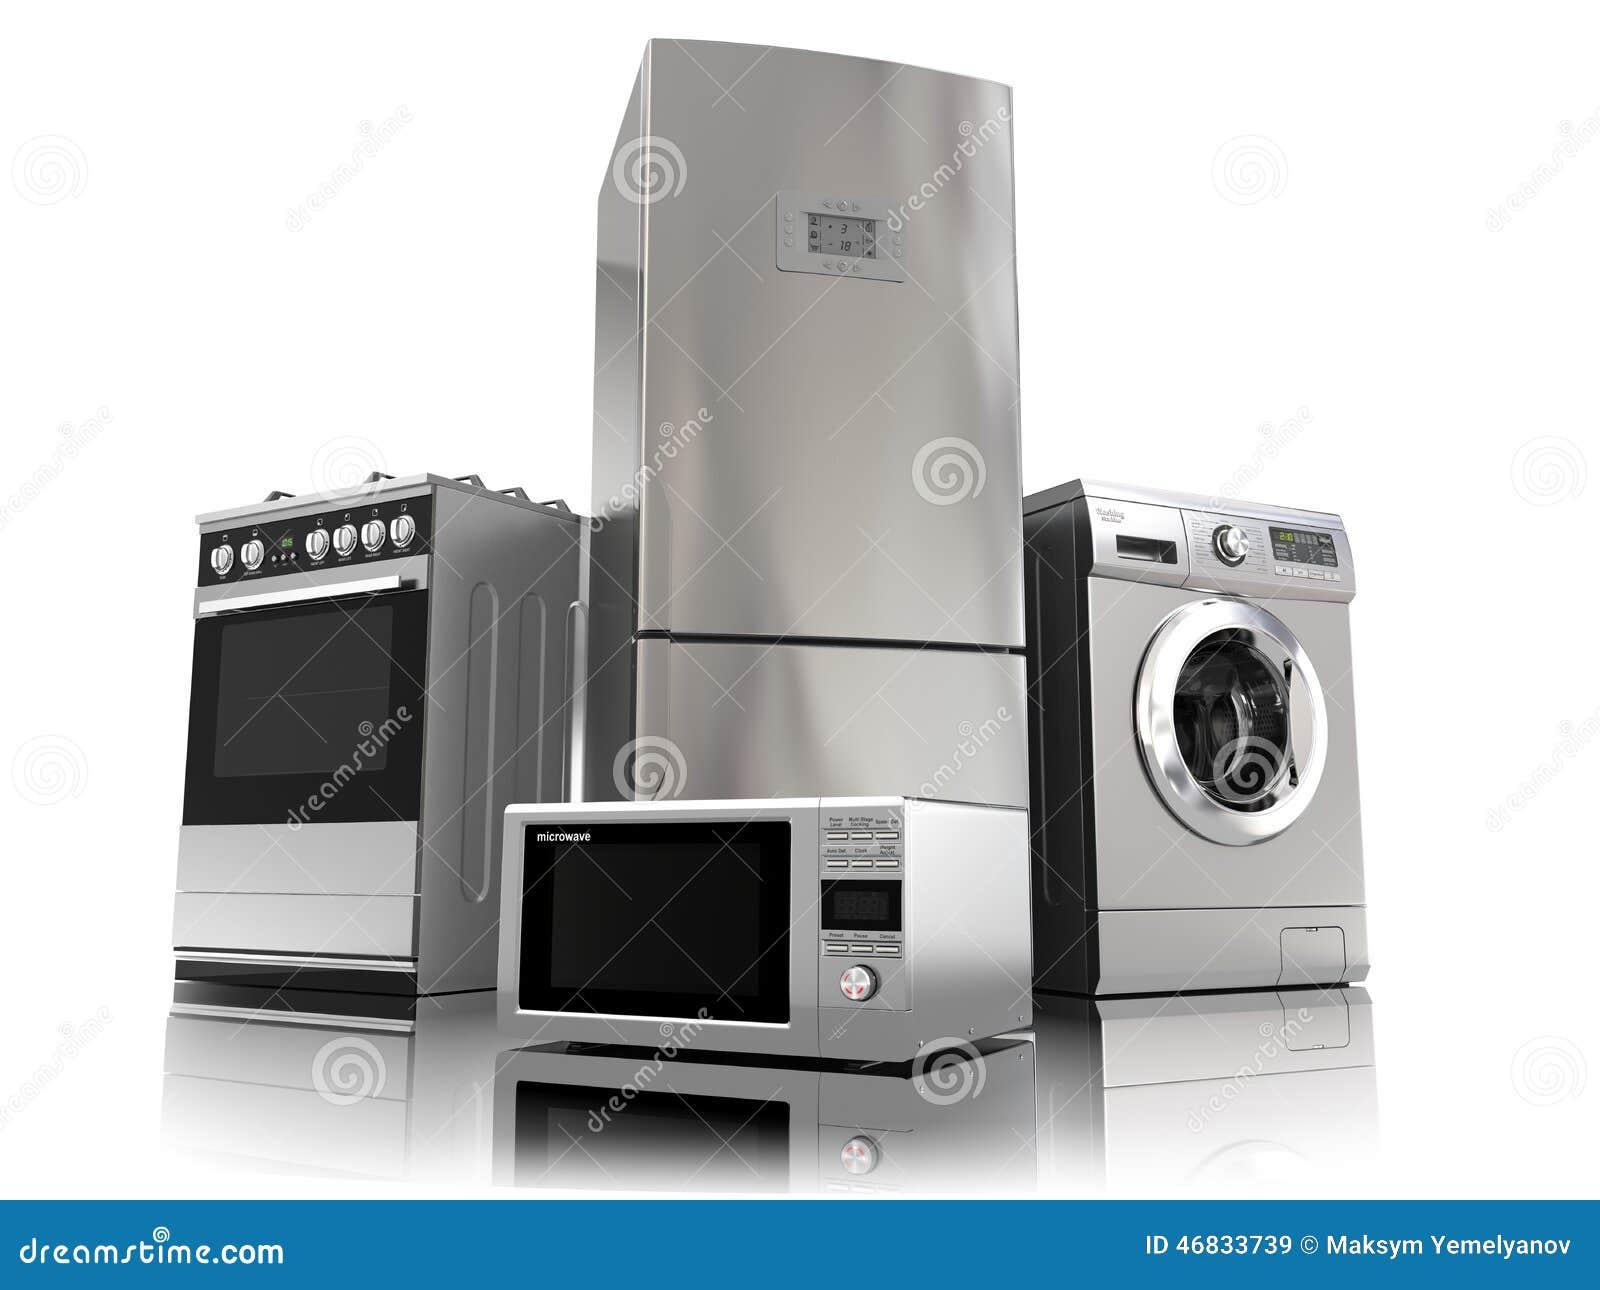 Uncategorized Household Kitchen Appliances home appliances set of household kitchen technics stock kitchen